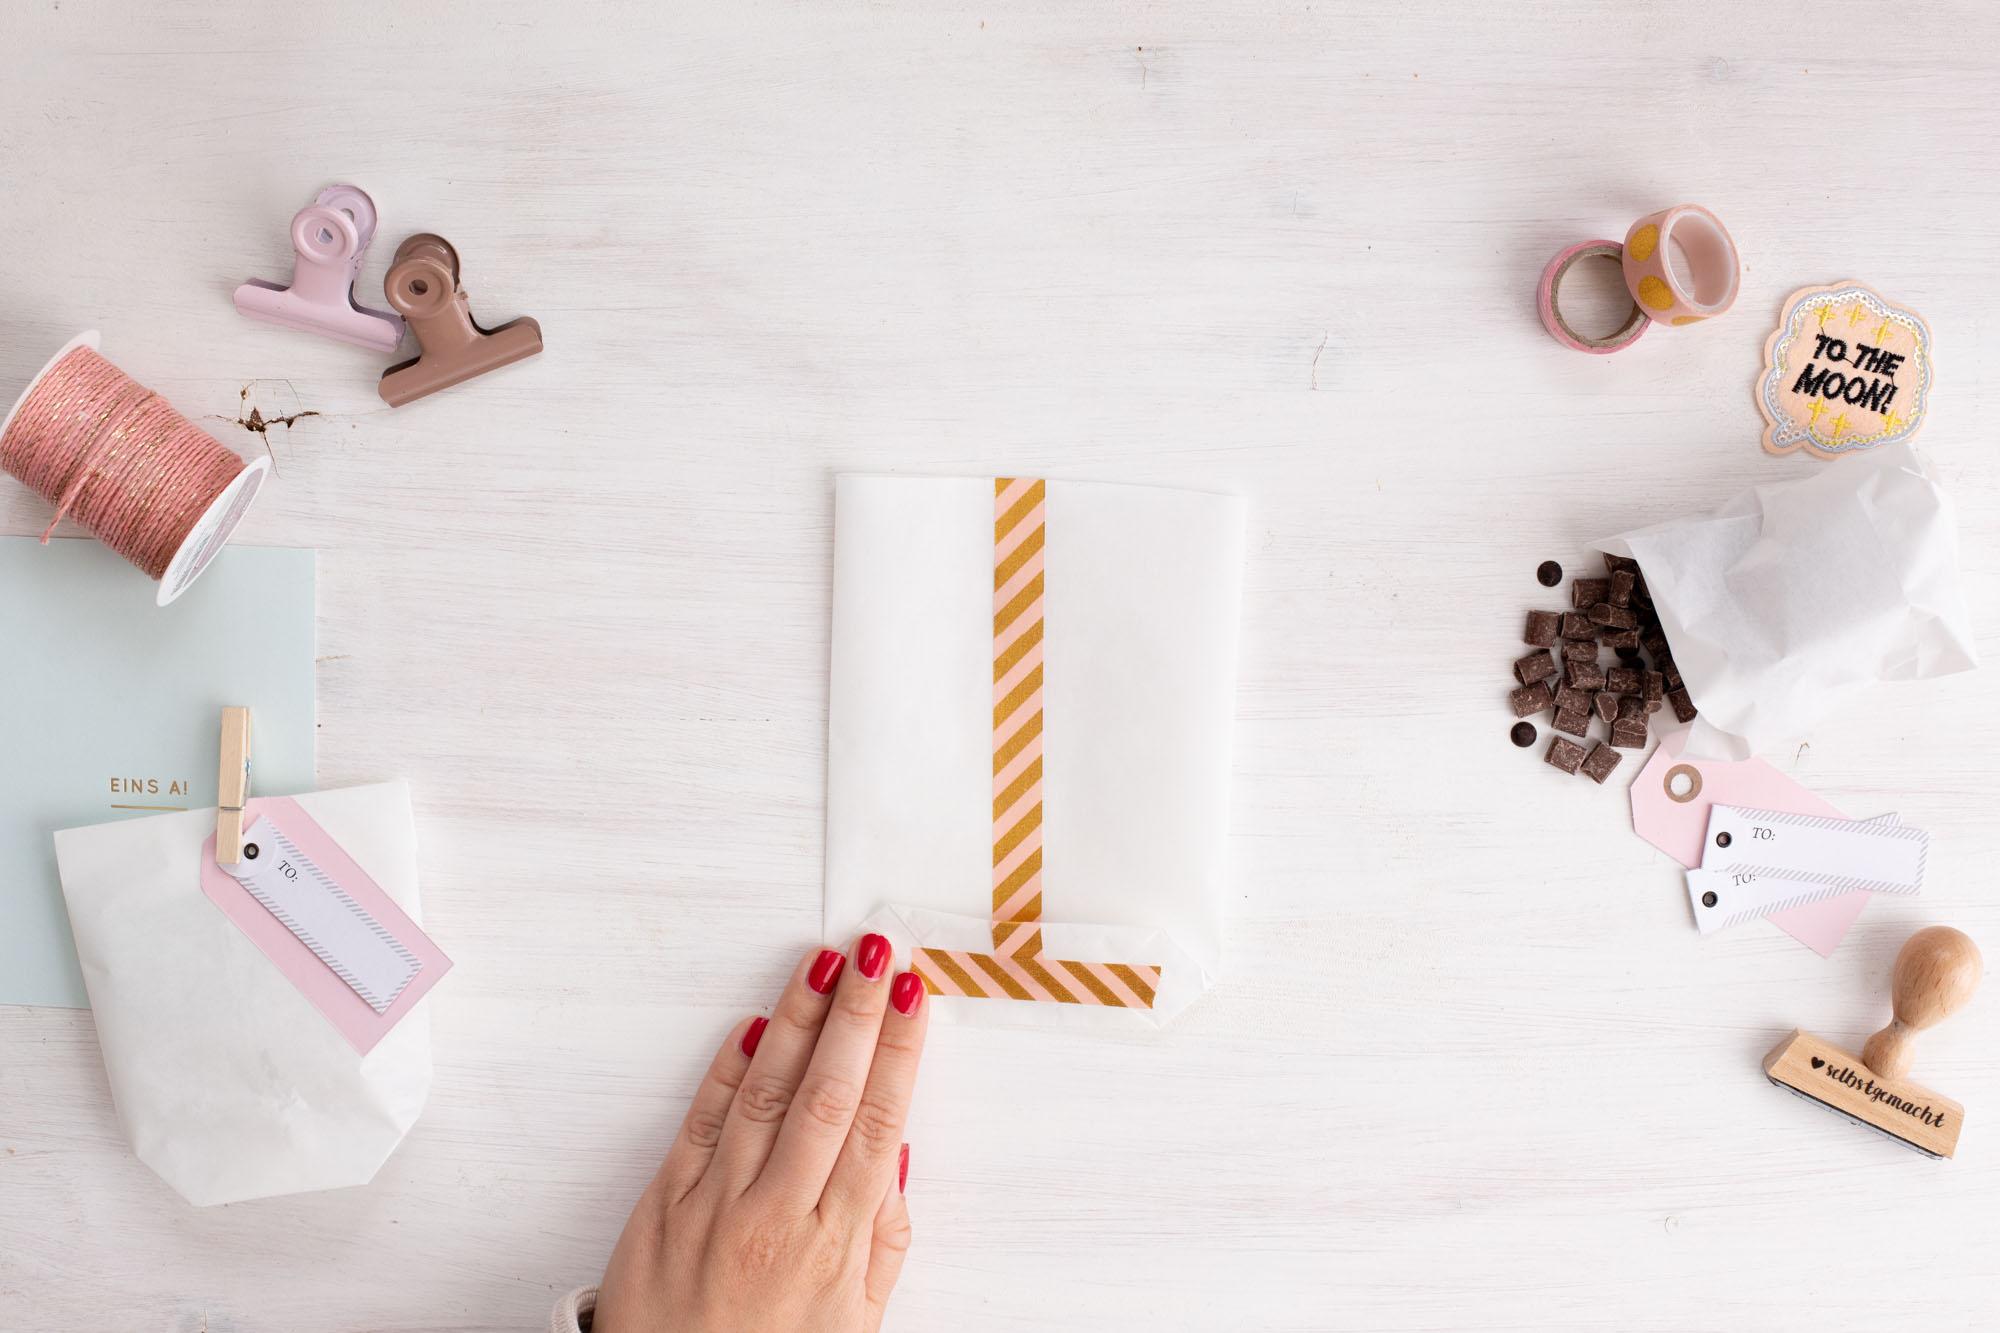 Papiertüten_als_Geschenktüten_für_kekse_basteln-Schritt_9_fertig